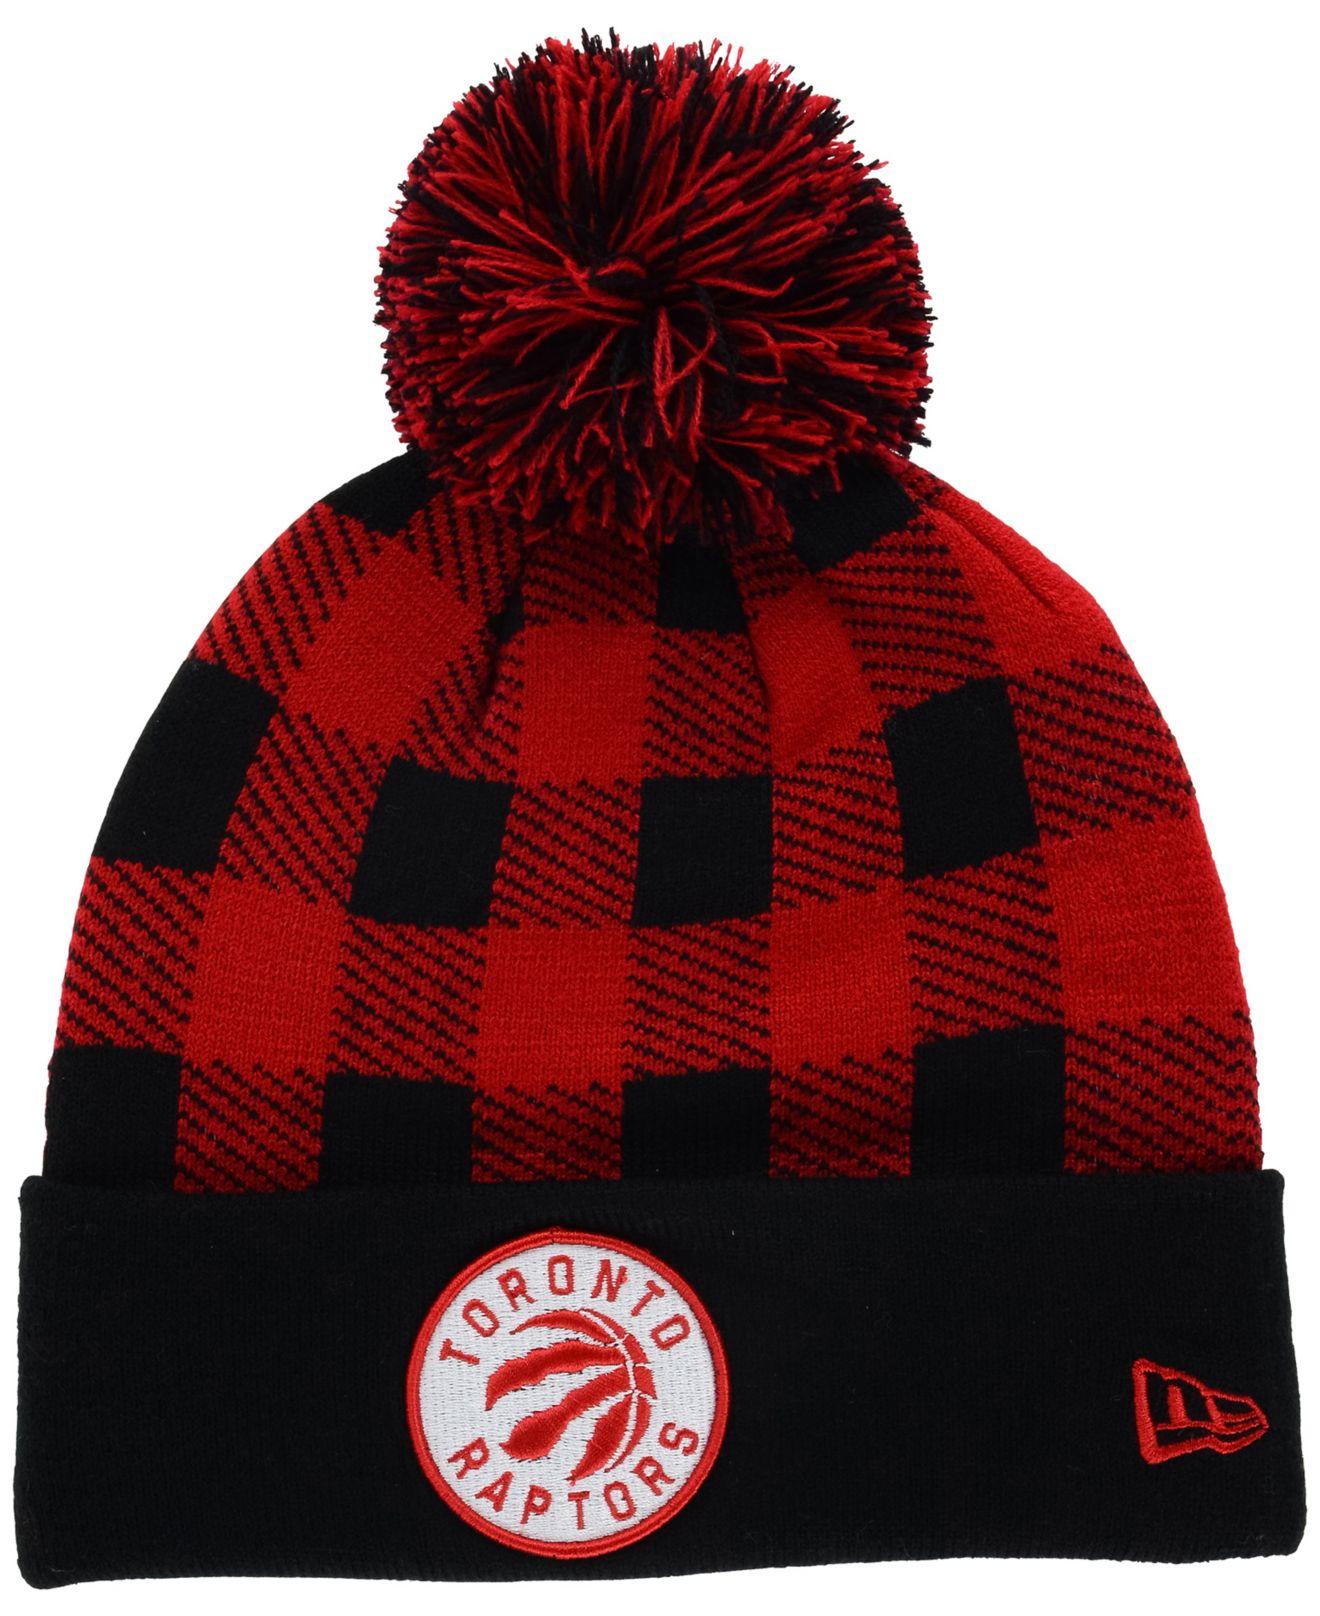 6cee0465676805 KTZ Toronto Raptors Buff Plaid Knit Hat in Red for Men - Lyst